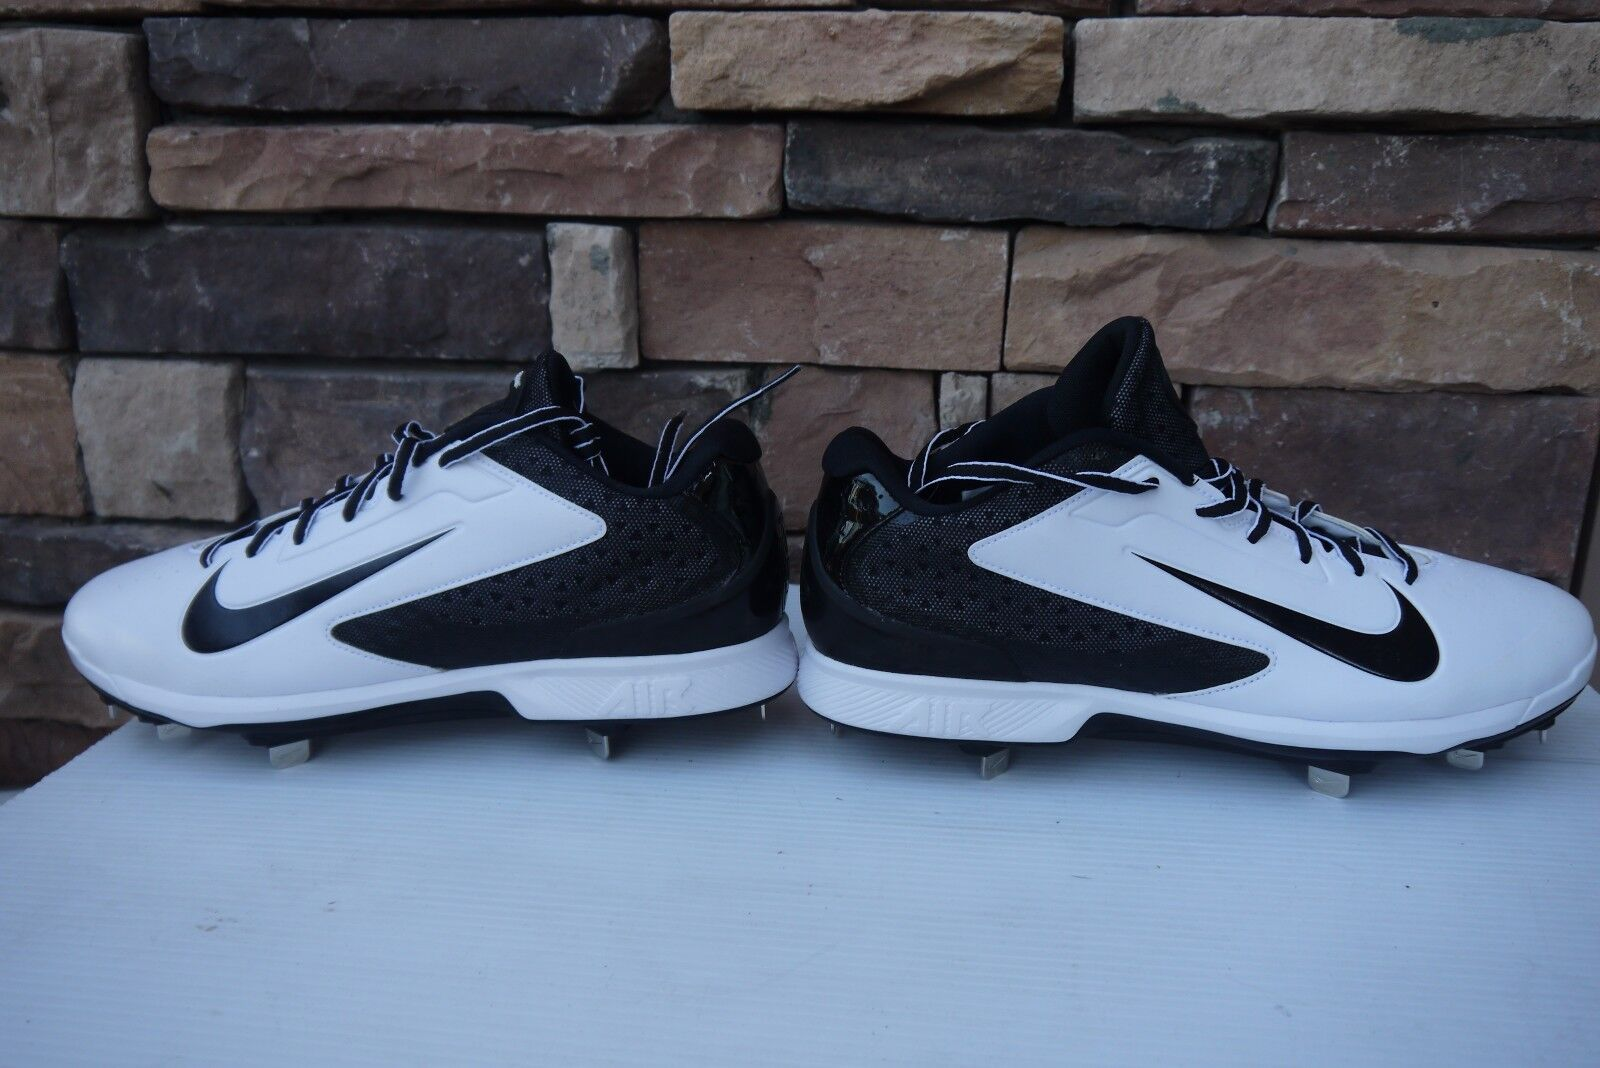 Nike Men's Huarache Pro Low Metal Baseball Cleats US 12   UK 11  EU 46